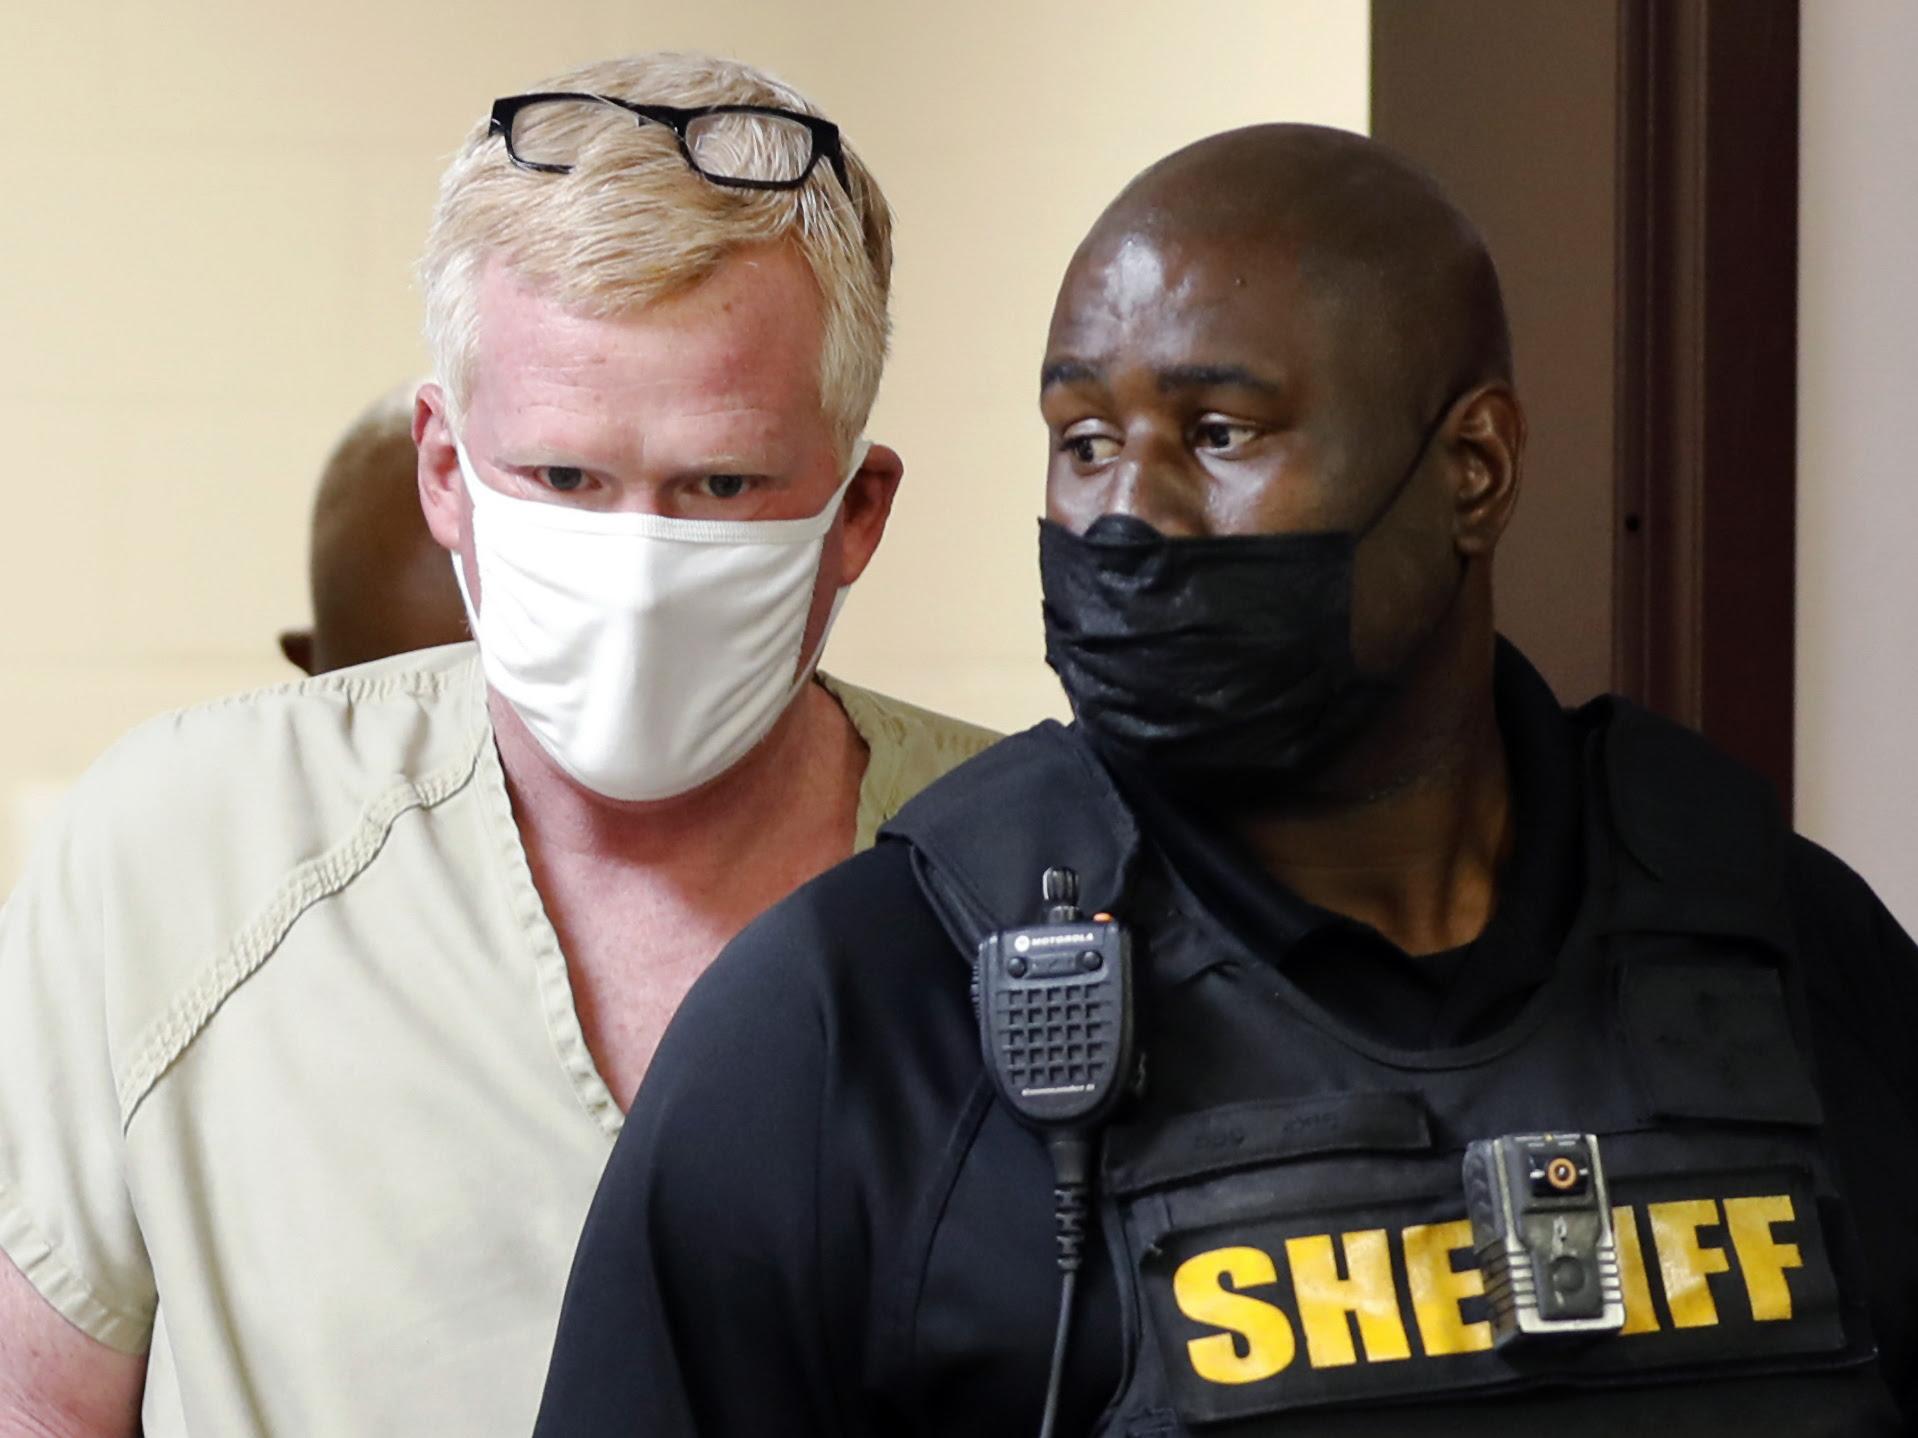 South Carolina lawyer Alex Murdaugh is arrested on new felony counts